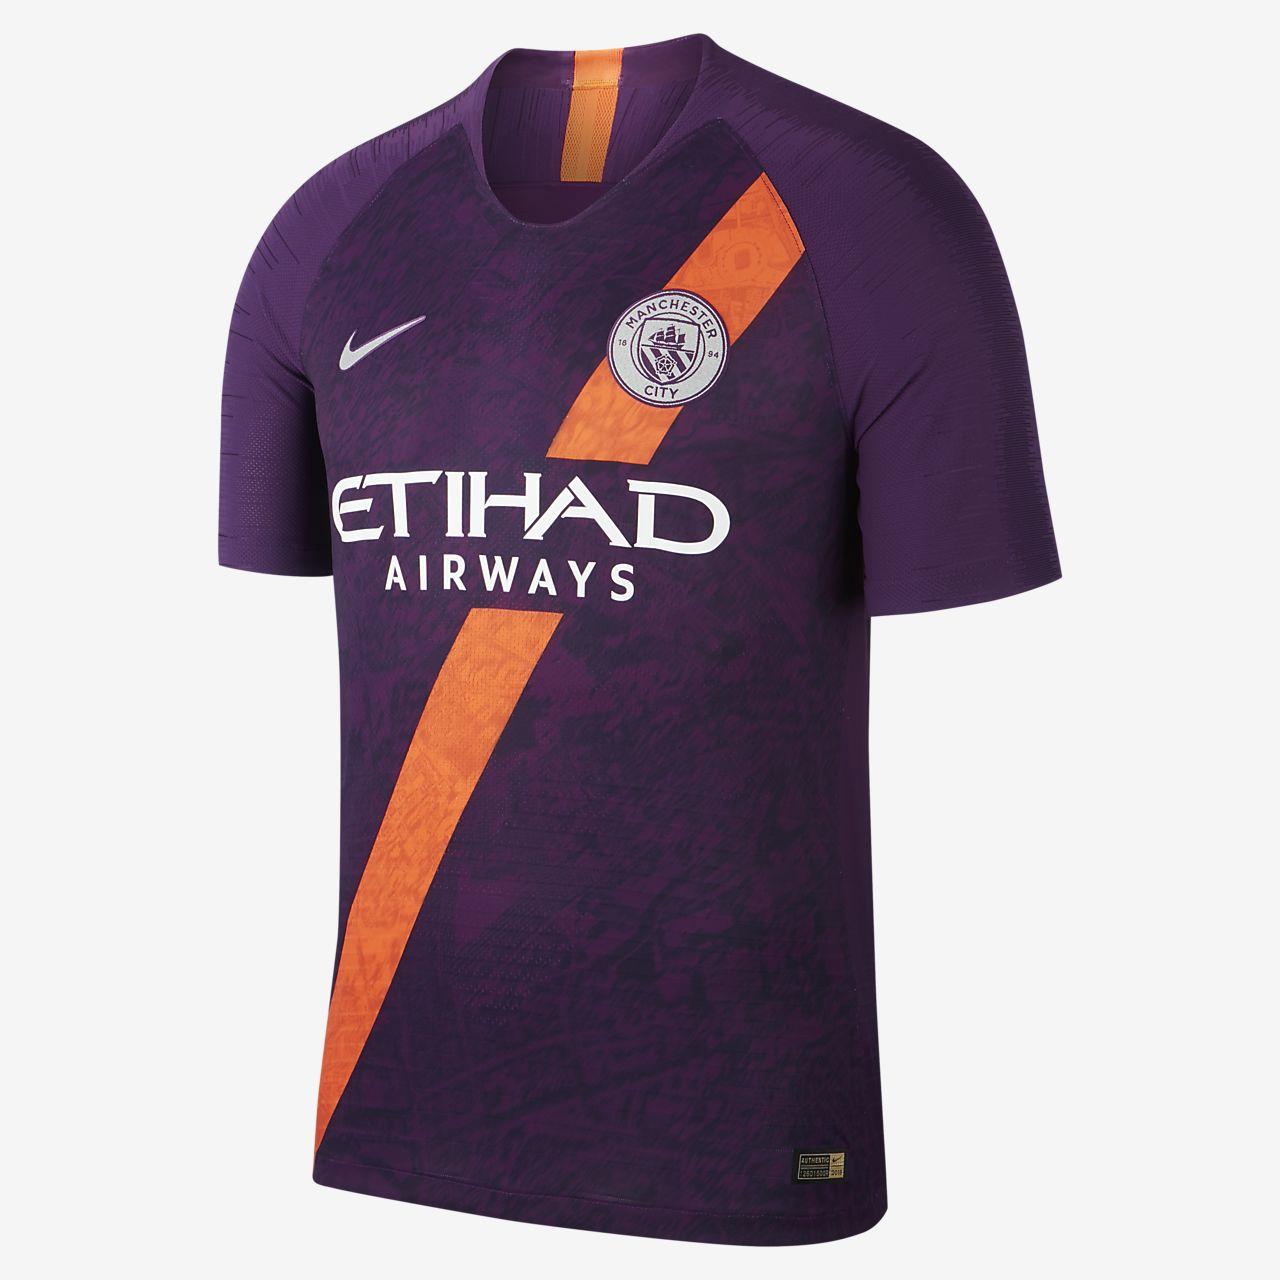 abbigliamento calcio Manchester City originale